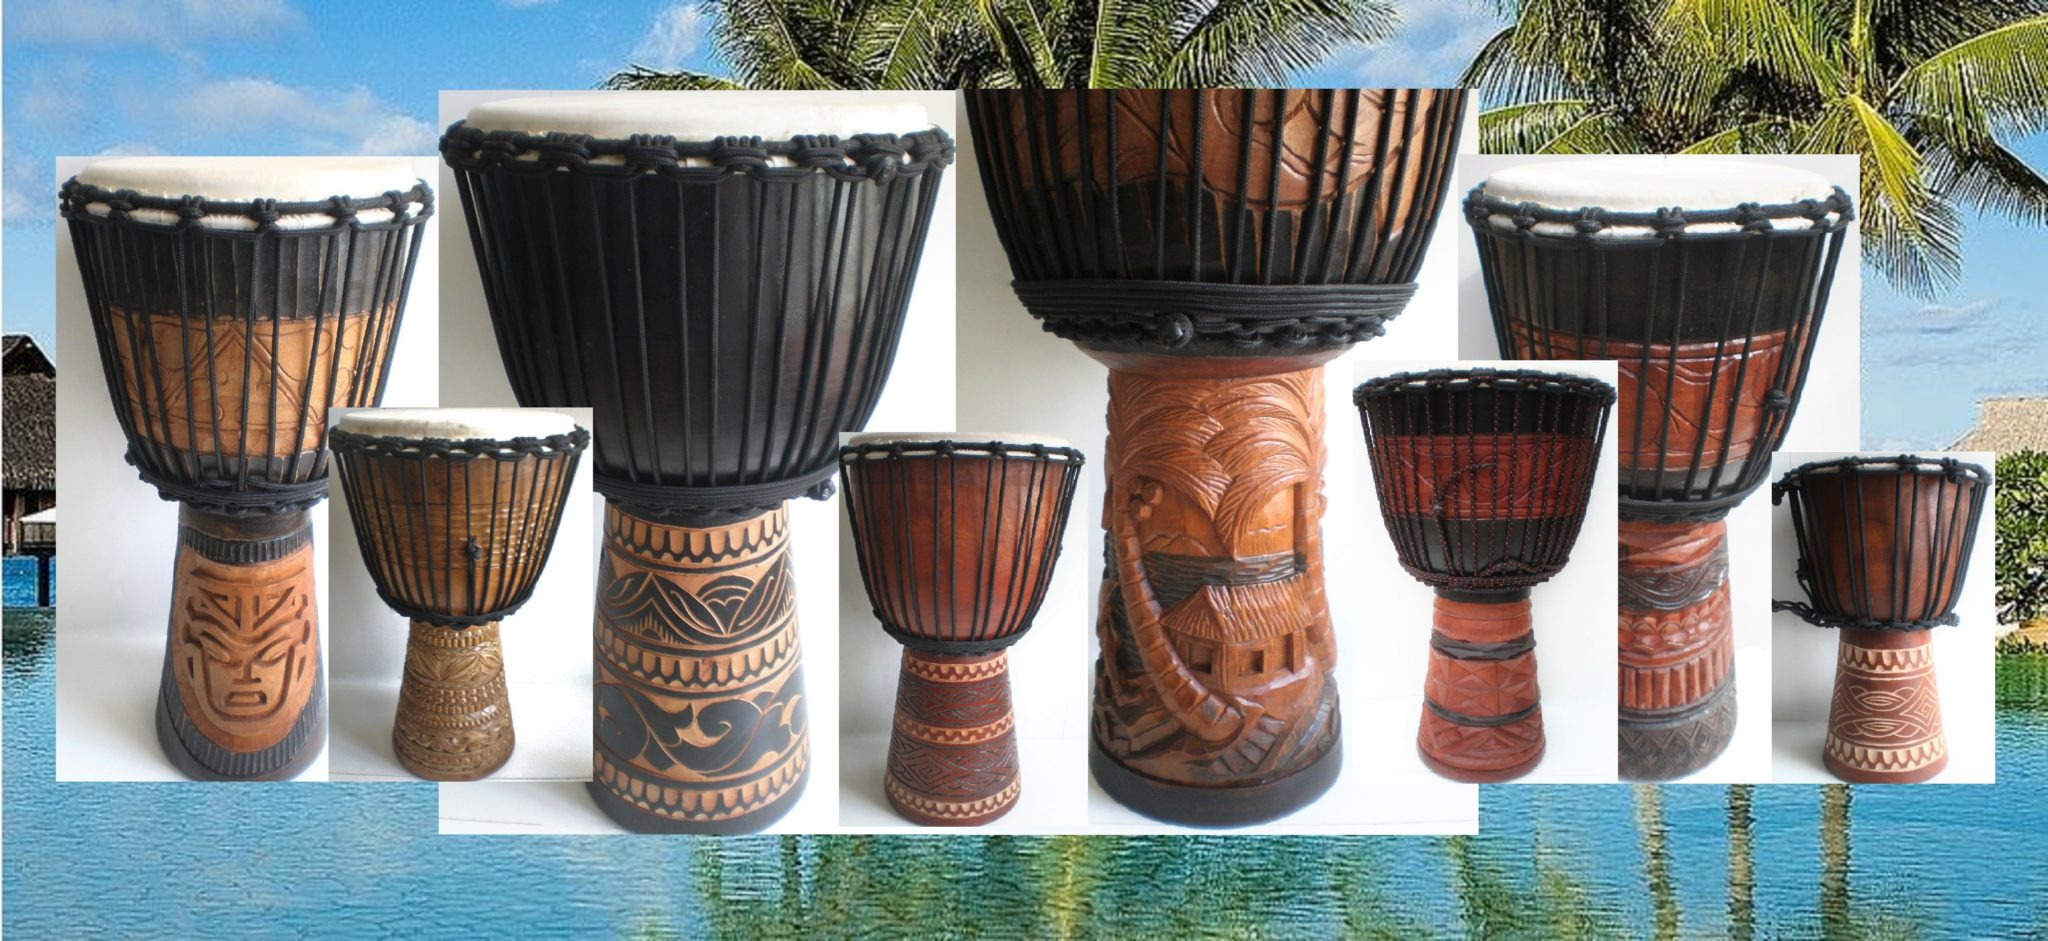 Djembe drums Adelaide Australia Bali Balinese mahogany wood 65 60 50 40 30 25 20cm